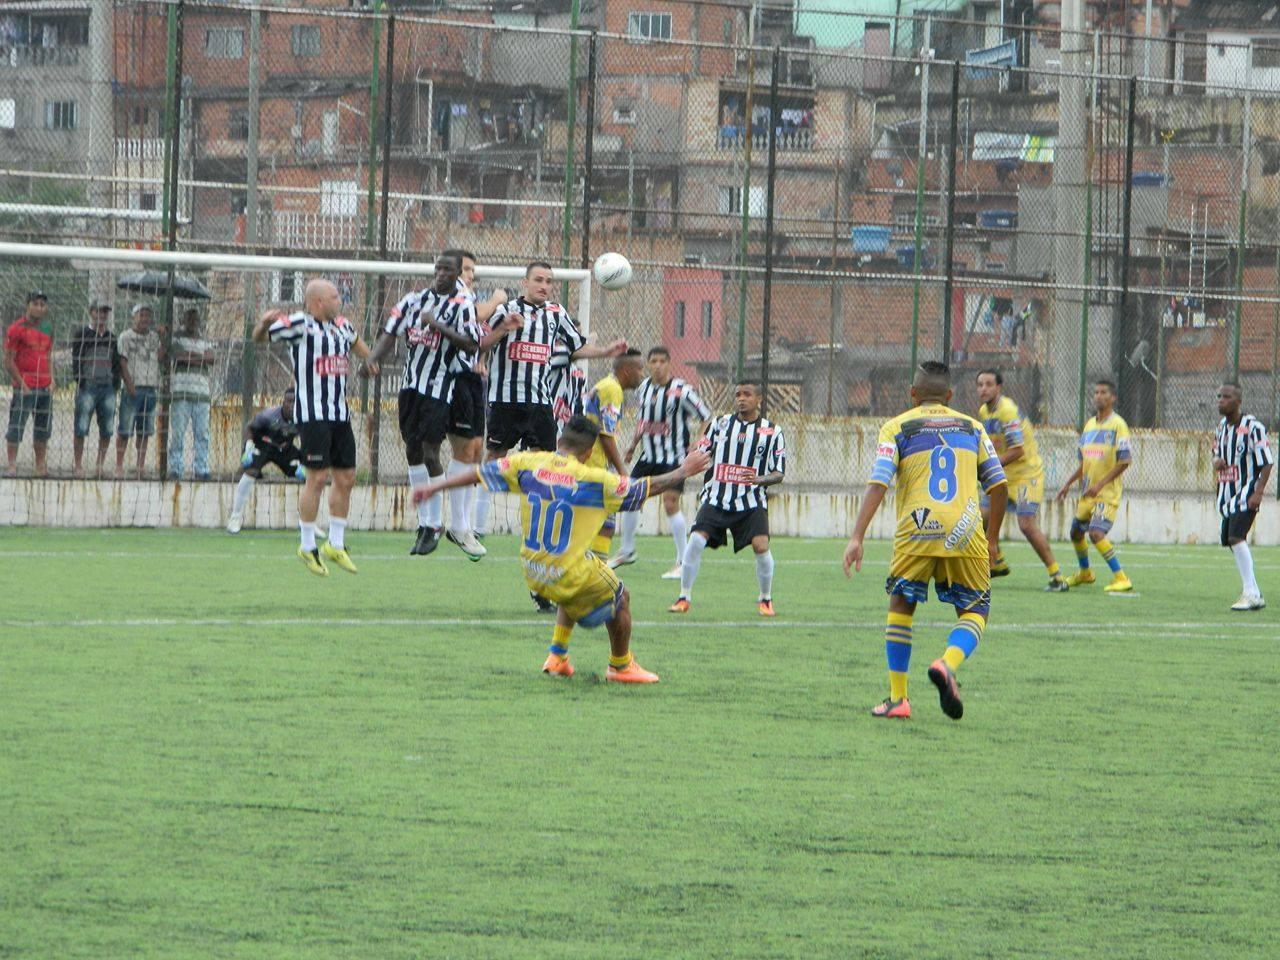 Mesmo com seis desfalques, Botafogo vence Coroa e se classifica na Copa Negritude